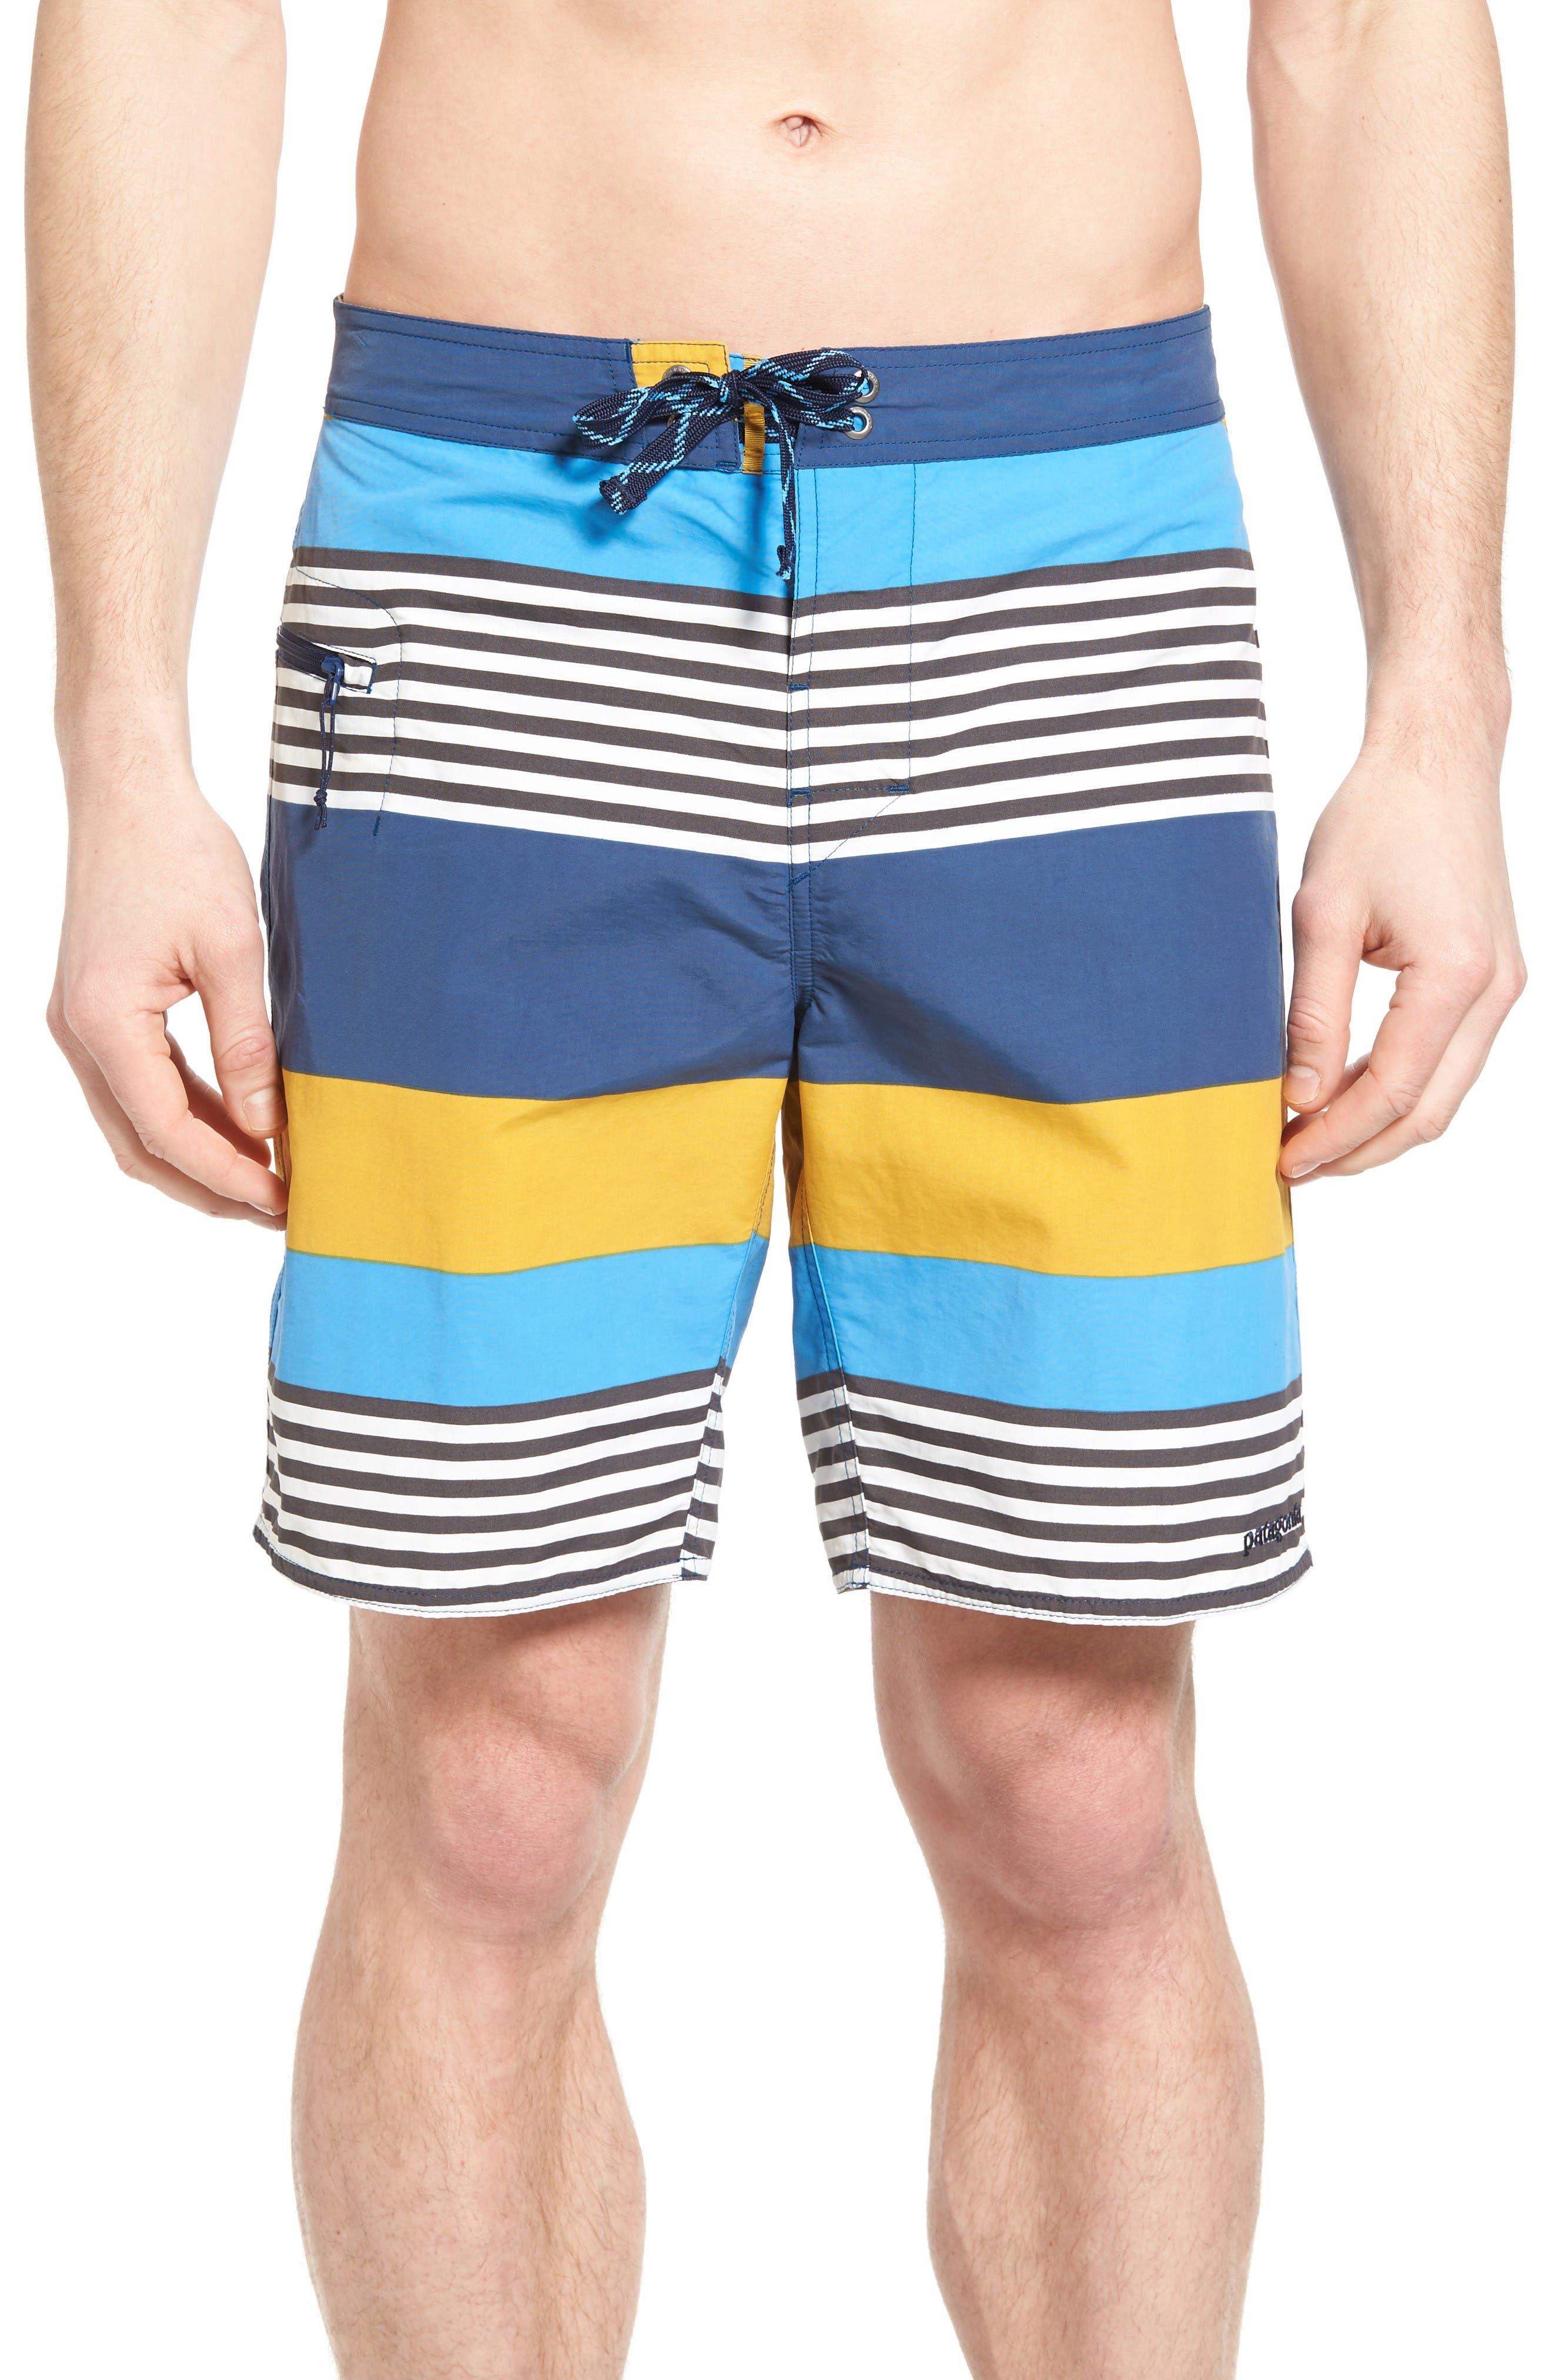 Wavefarer Board Shorts,                             Main thumbnail 1, color,                             Yurt Yellow